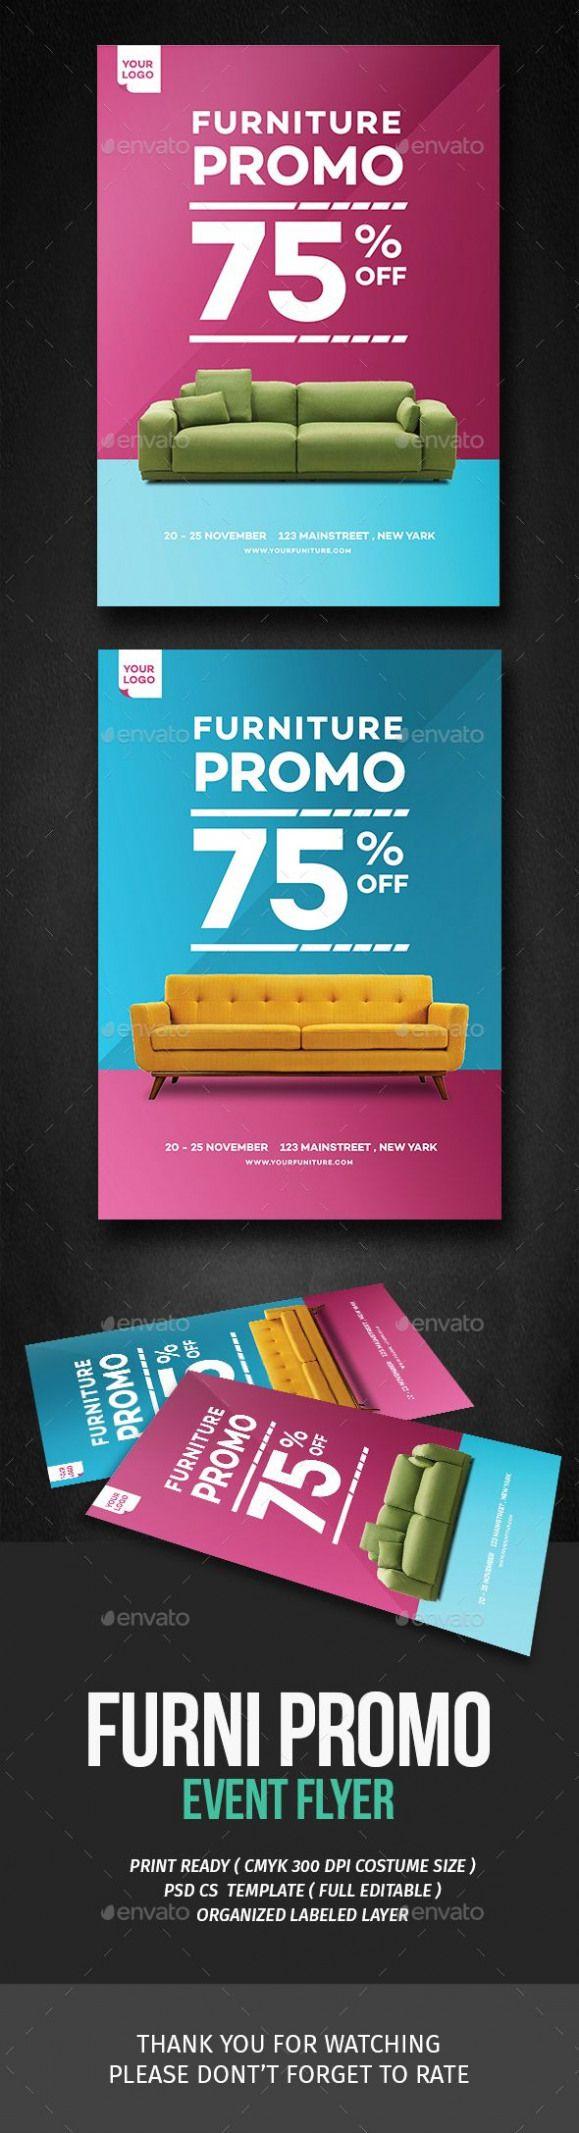 Home furniture promo flyer furniture designs furniture design